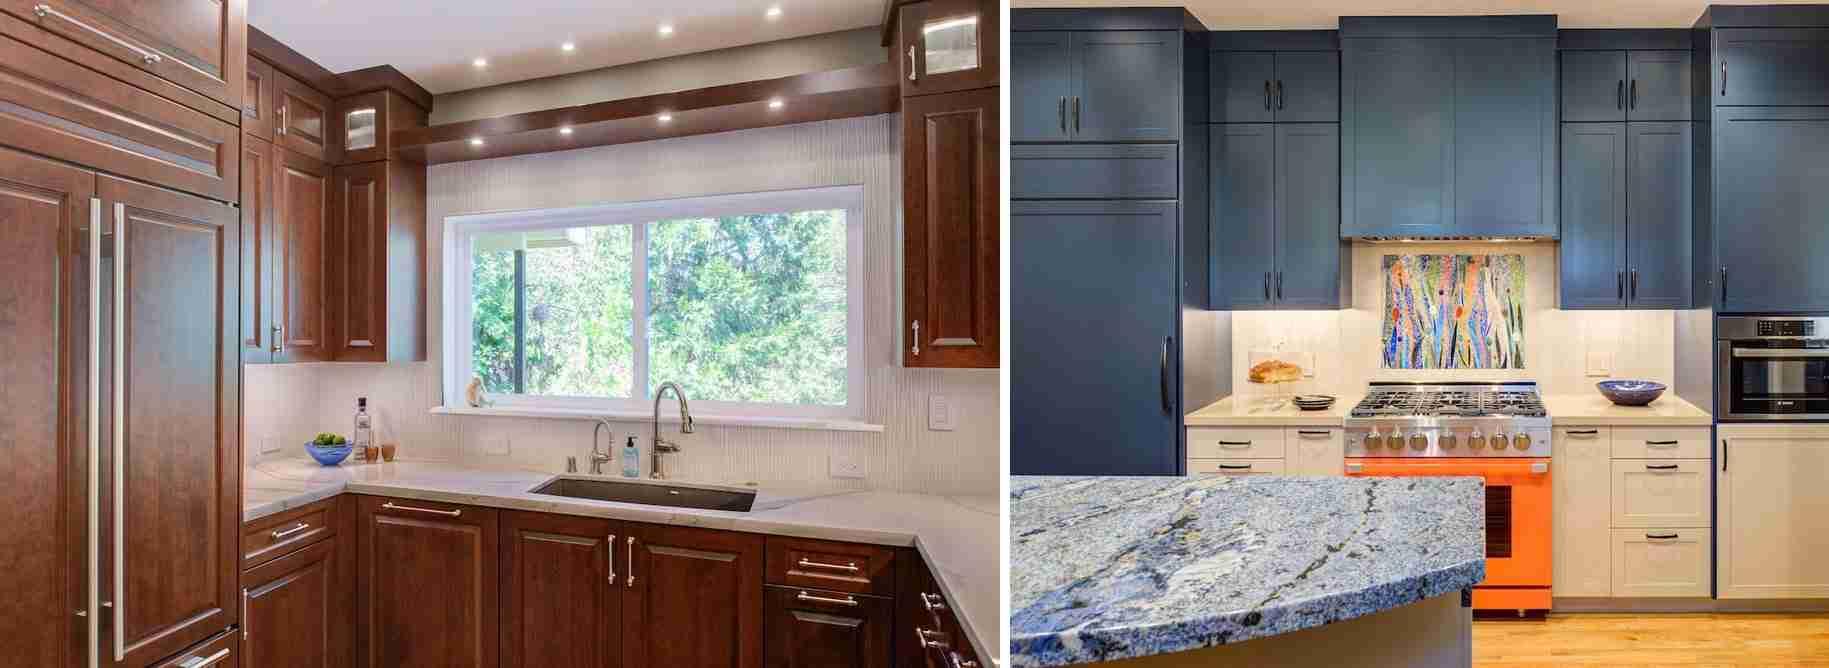 Cabinet Lighting Trends Harrell Remodeling Inc Design